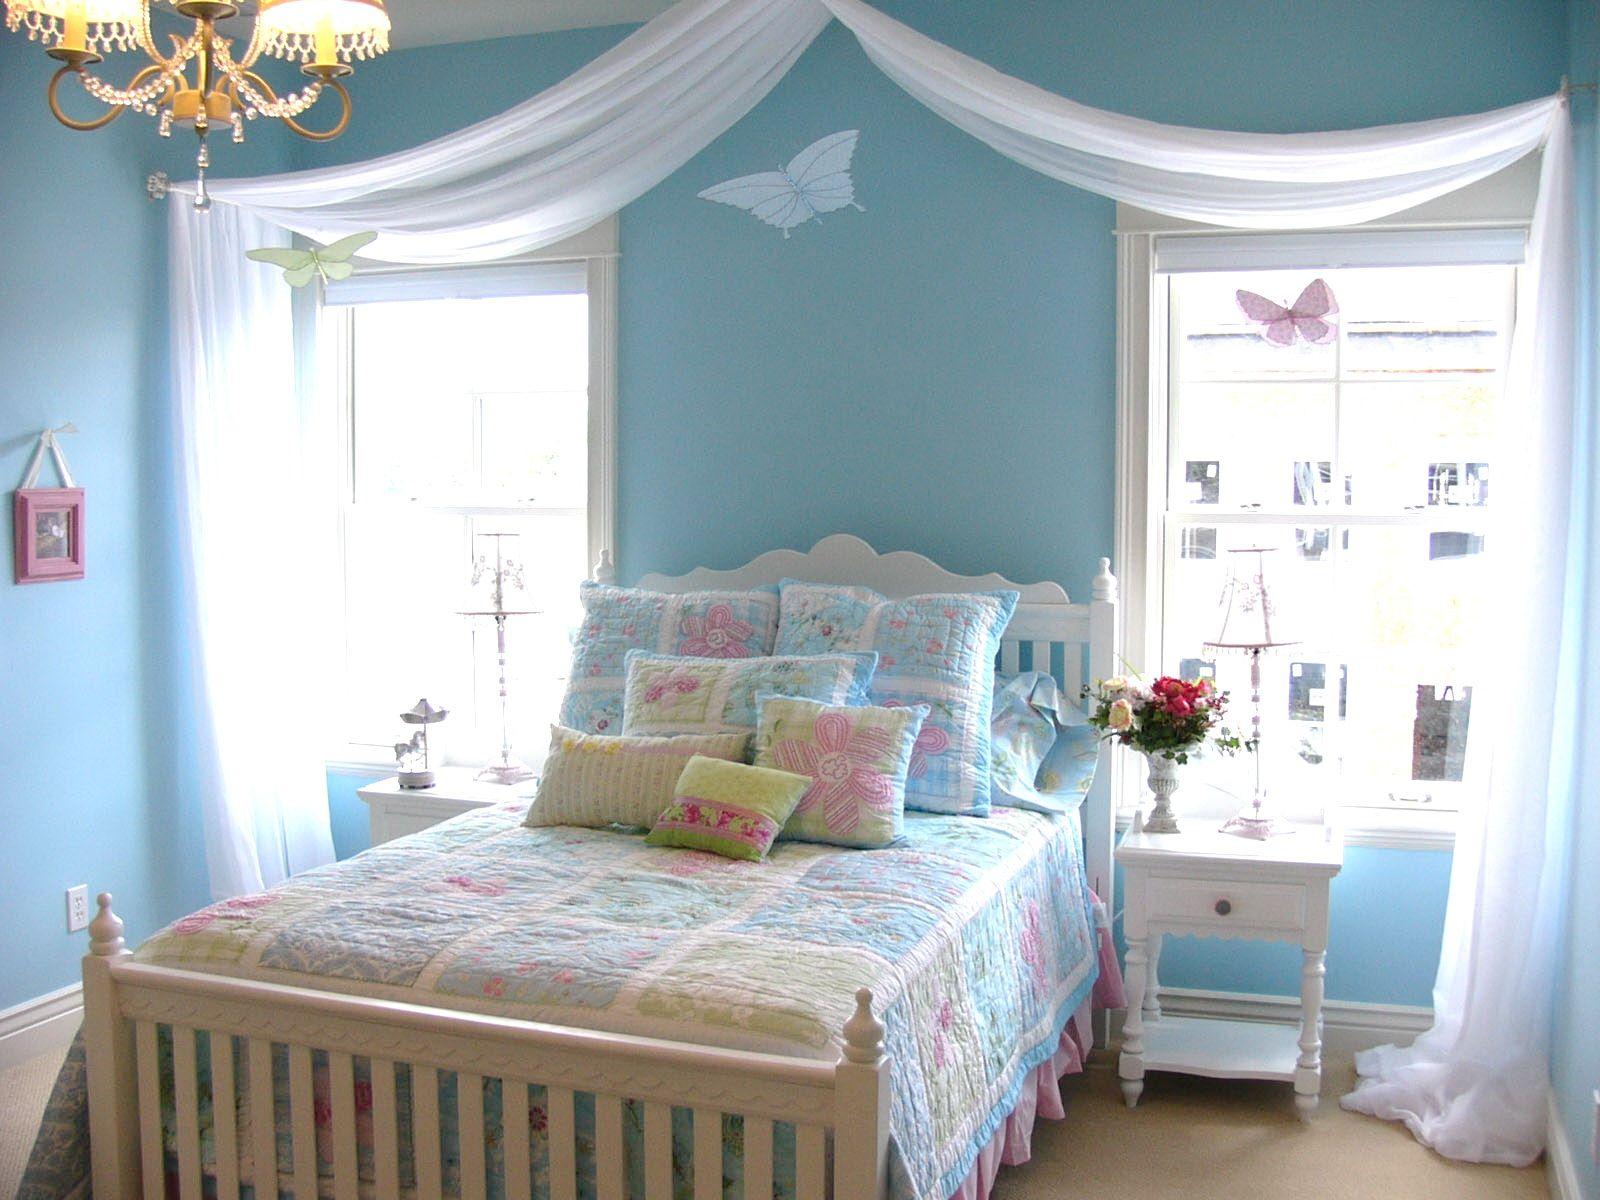 I Love The Sheer Fabric Draped Across The Room &